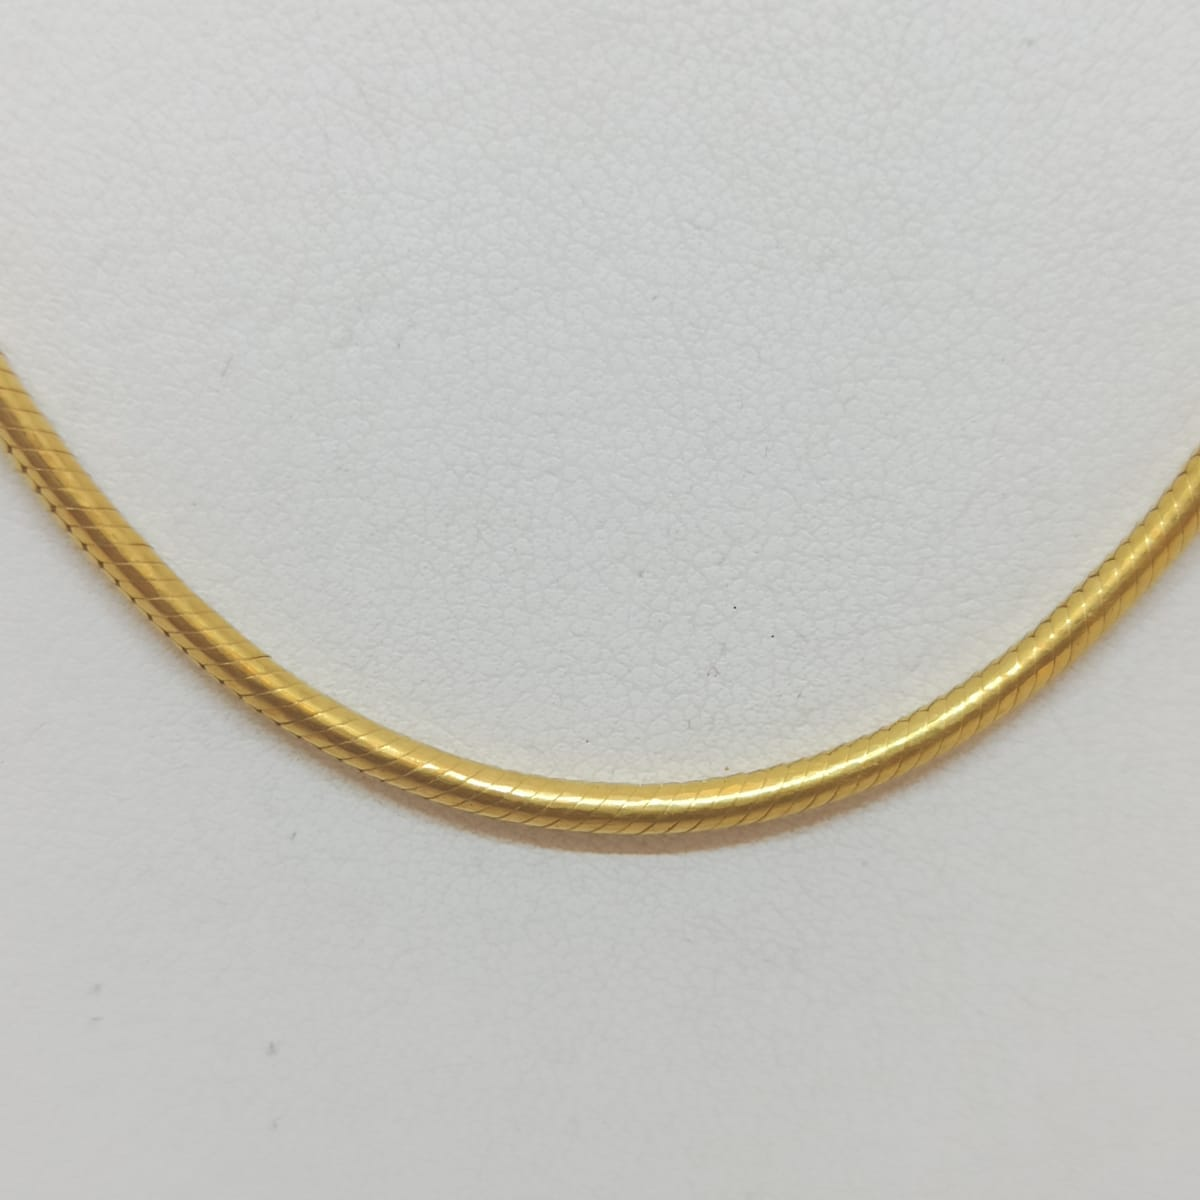 Dil Cz Chain